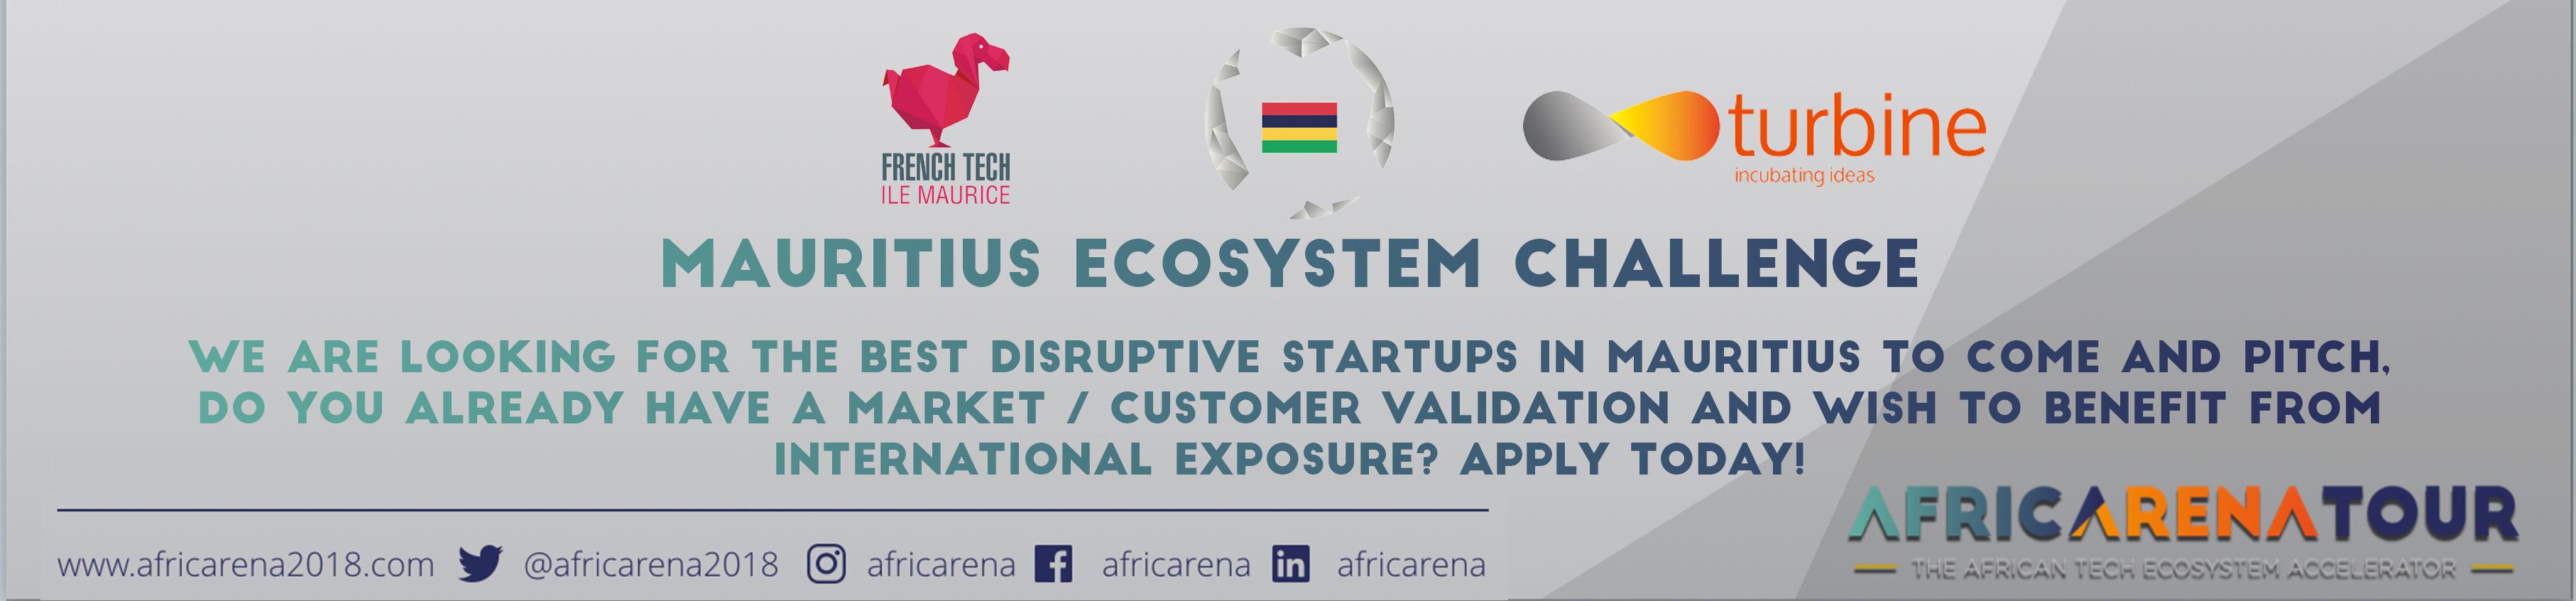 Mauritius Ecosystem Challenge